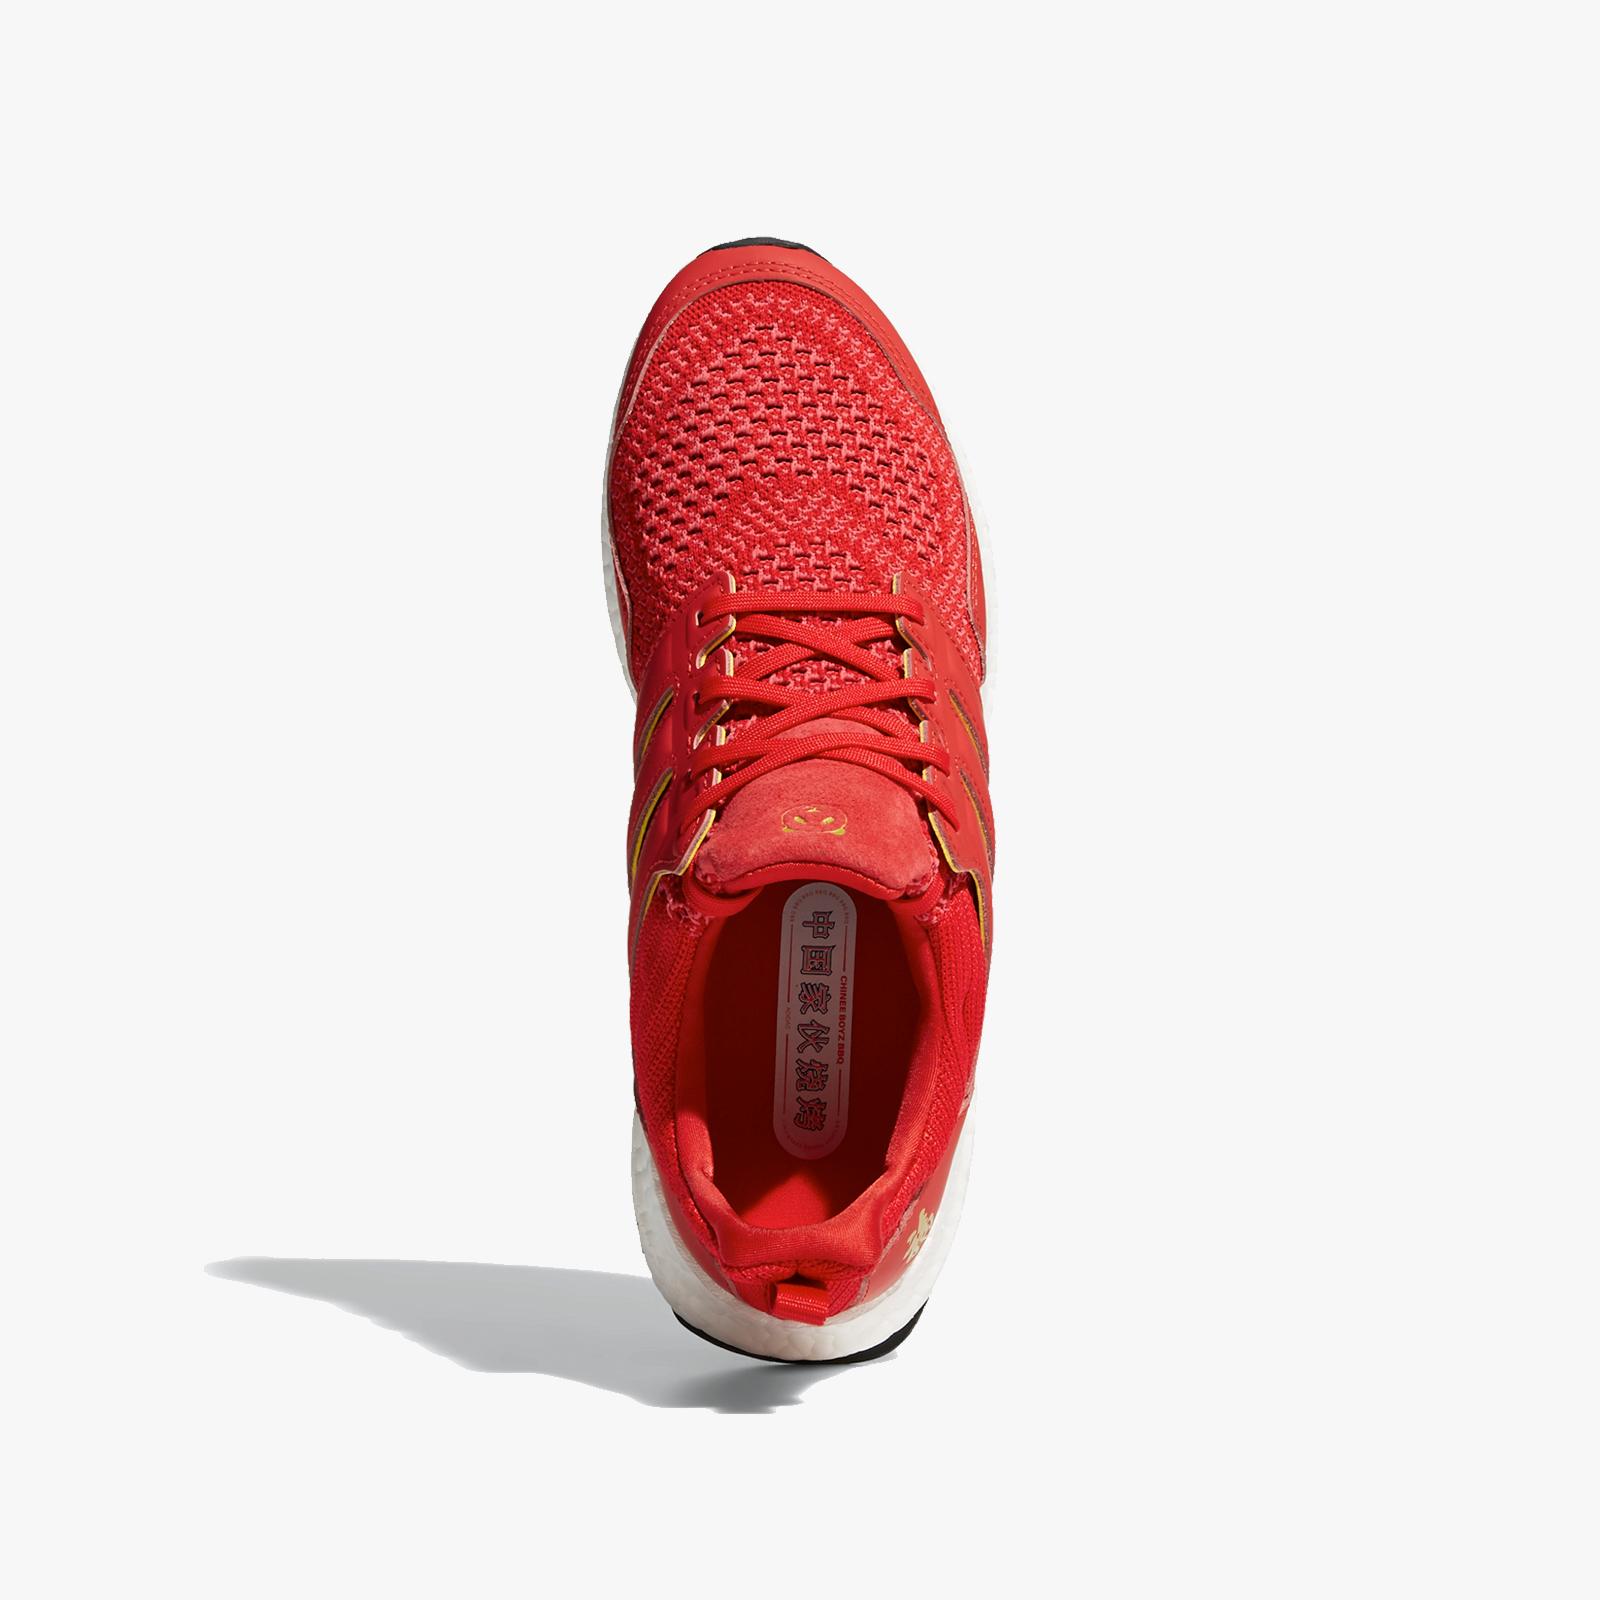 adidas UltraBOOST Eddie Huang CNY